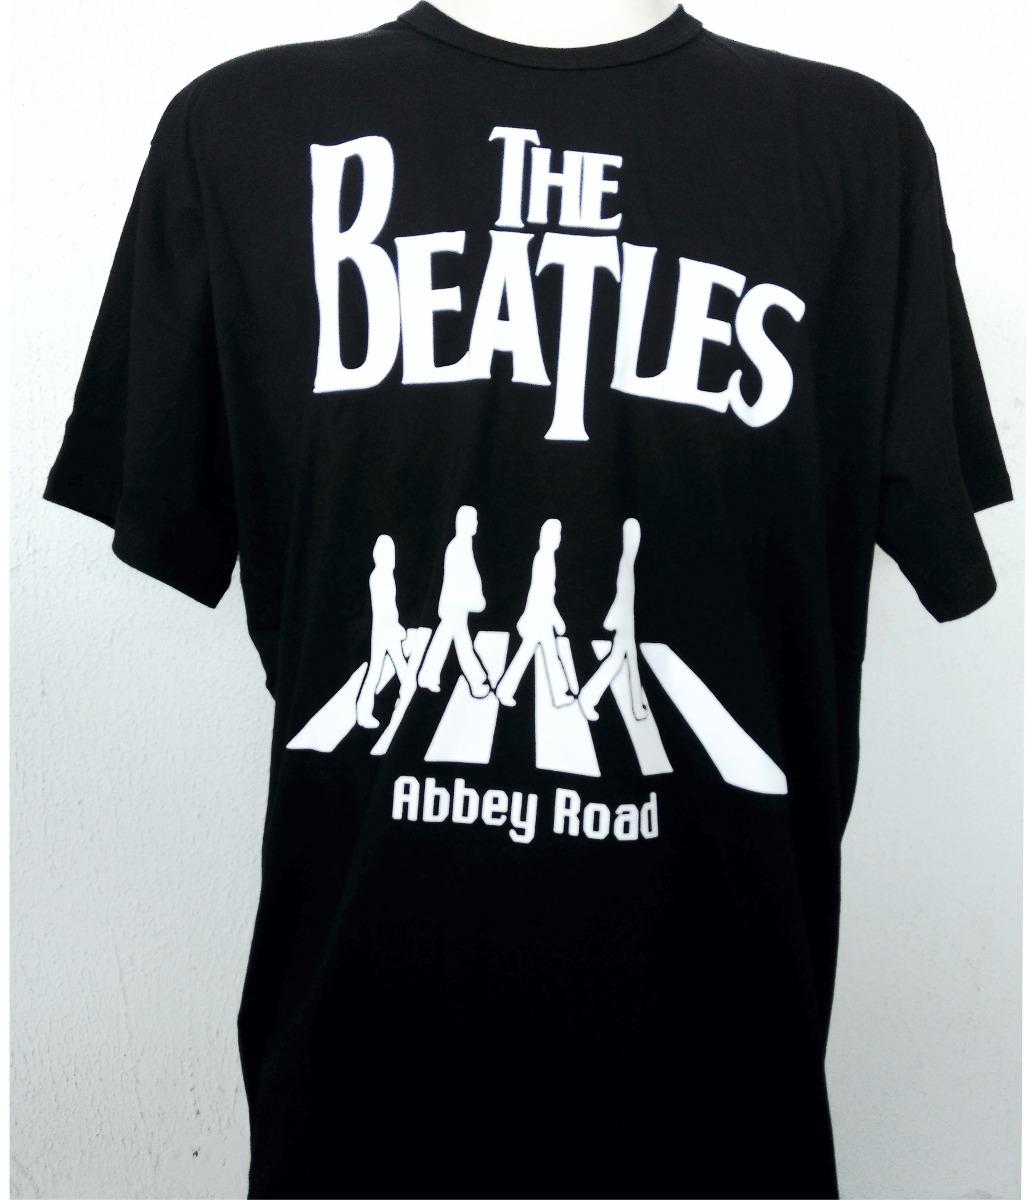 62bf254b3 Camisa Camiseta The Beatles Abbey Road Banda De Rock - R  39